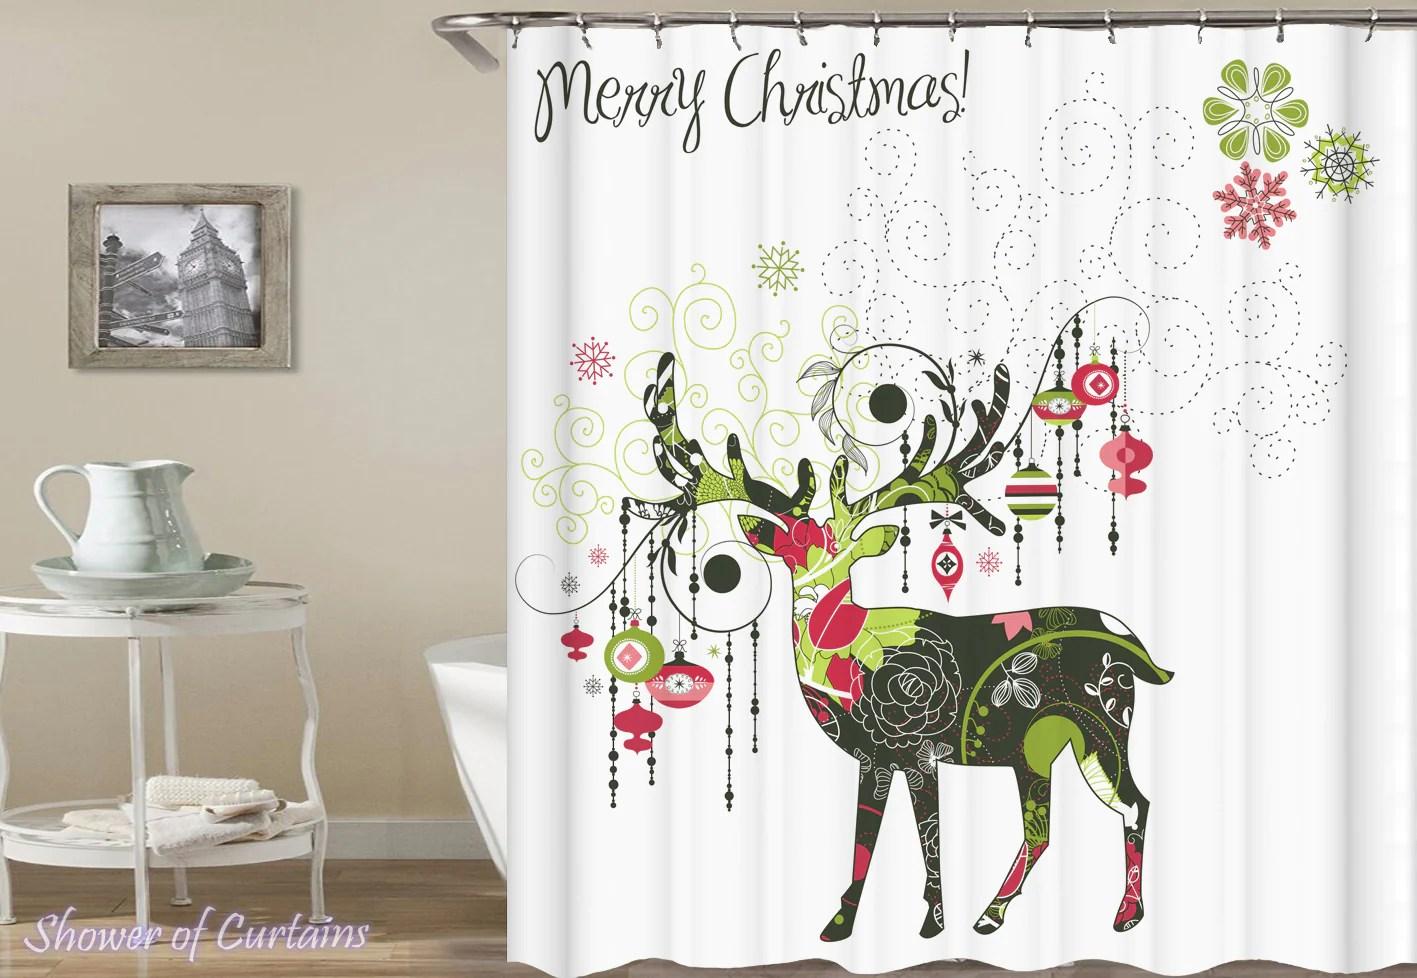 Luxurious Canada Shower Curtains Hooks Shower Curtains S Shower Curtains Merry Decorative Reindeer Shower Curtains Merry Decorative Reindeer Shower houzz-03 Christmas Shower Curtains